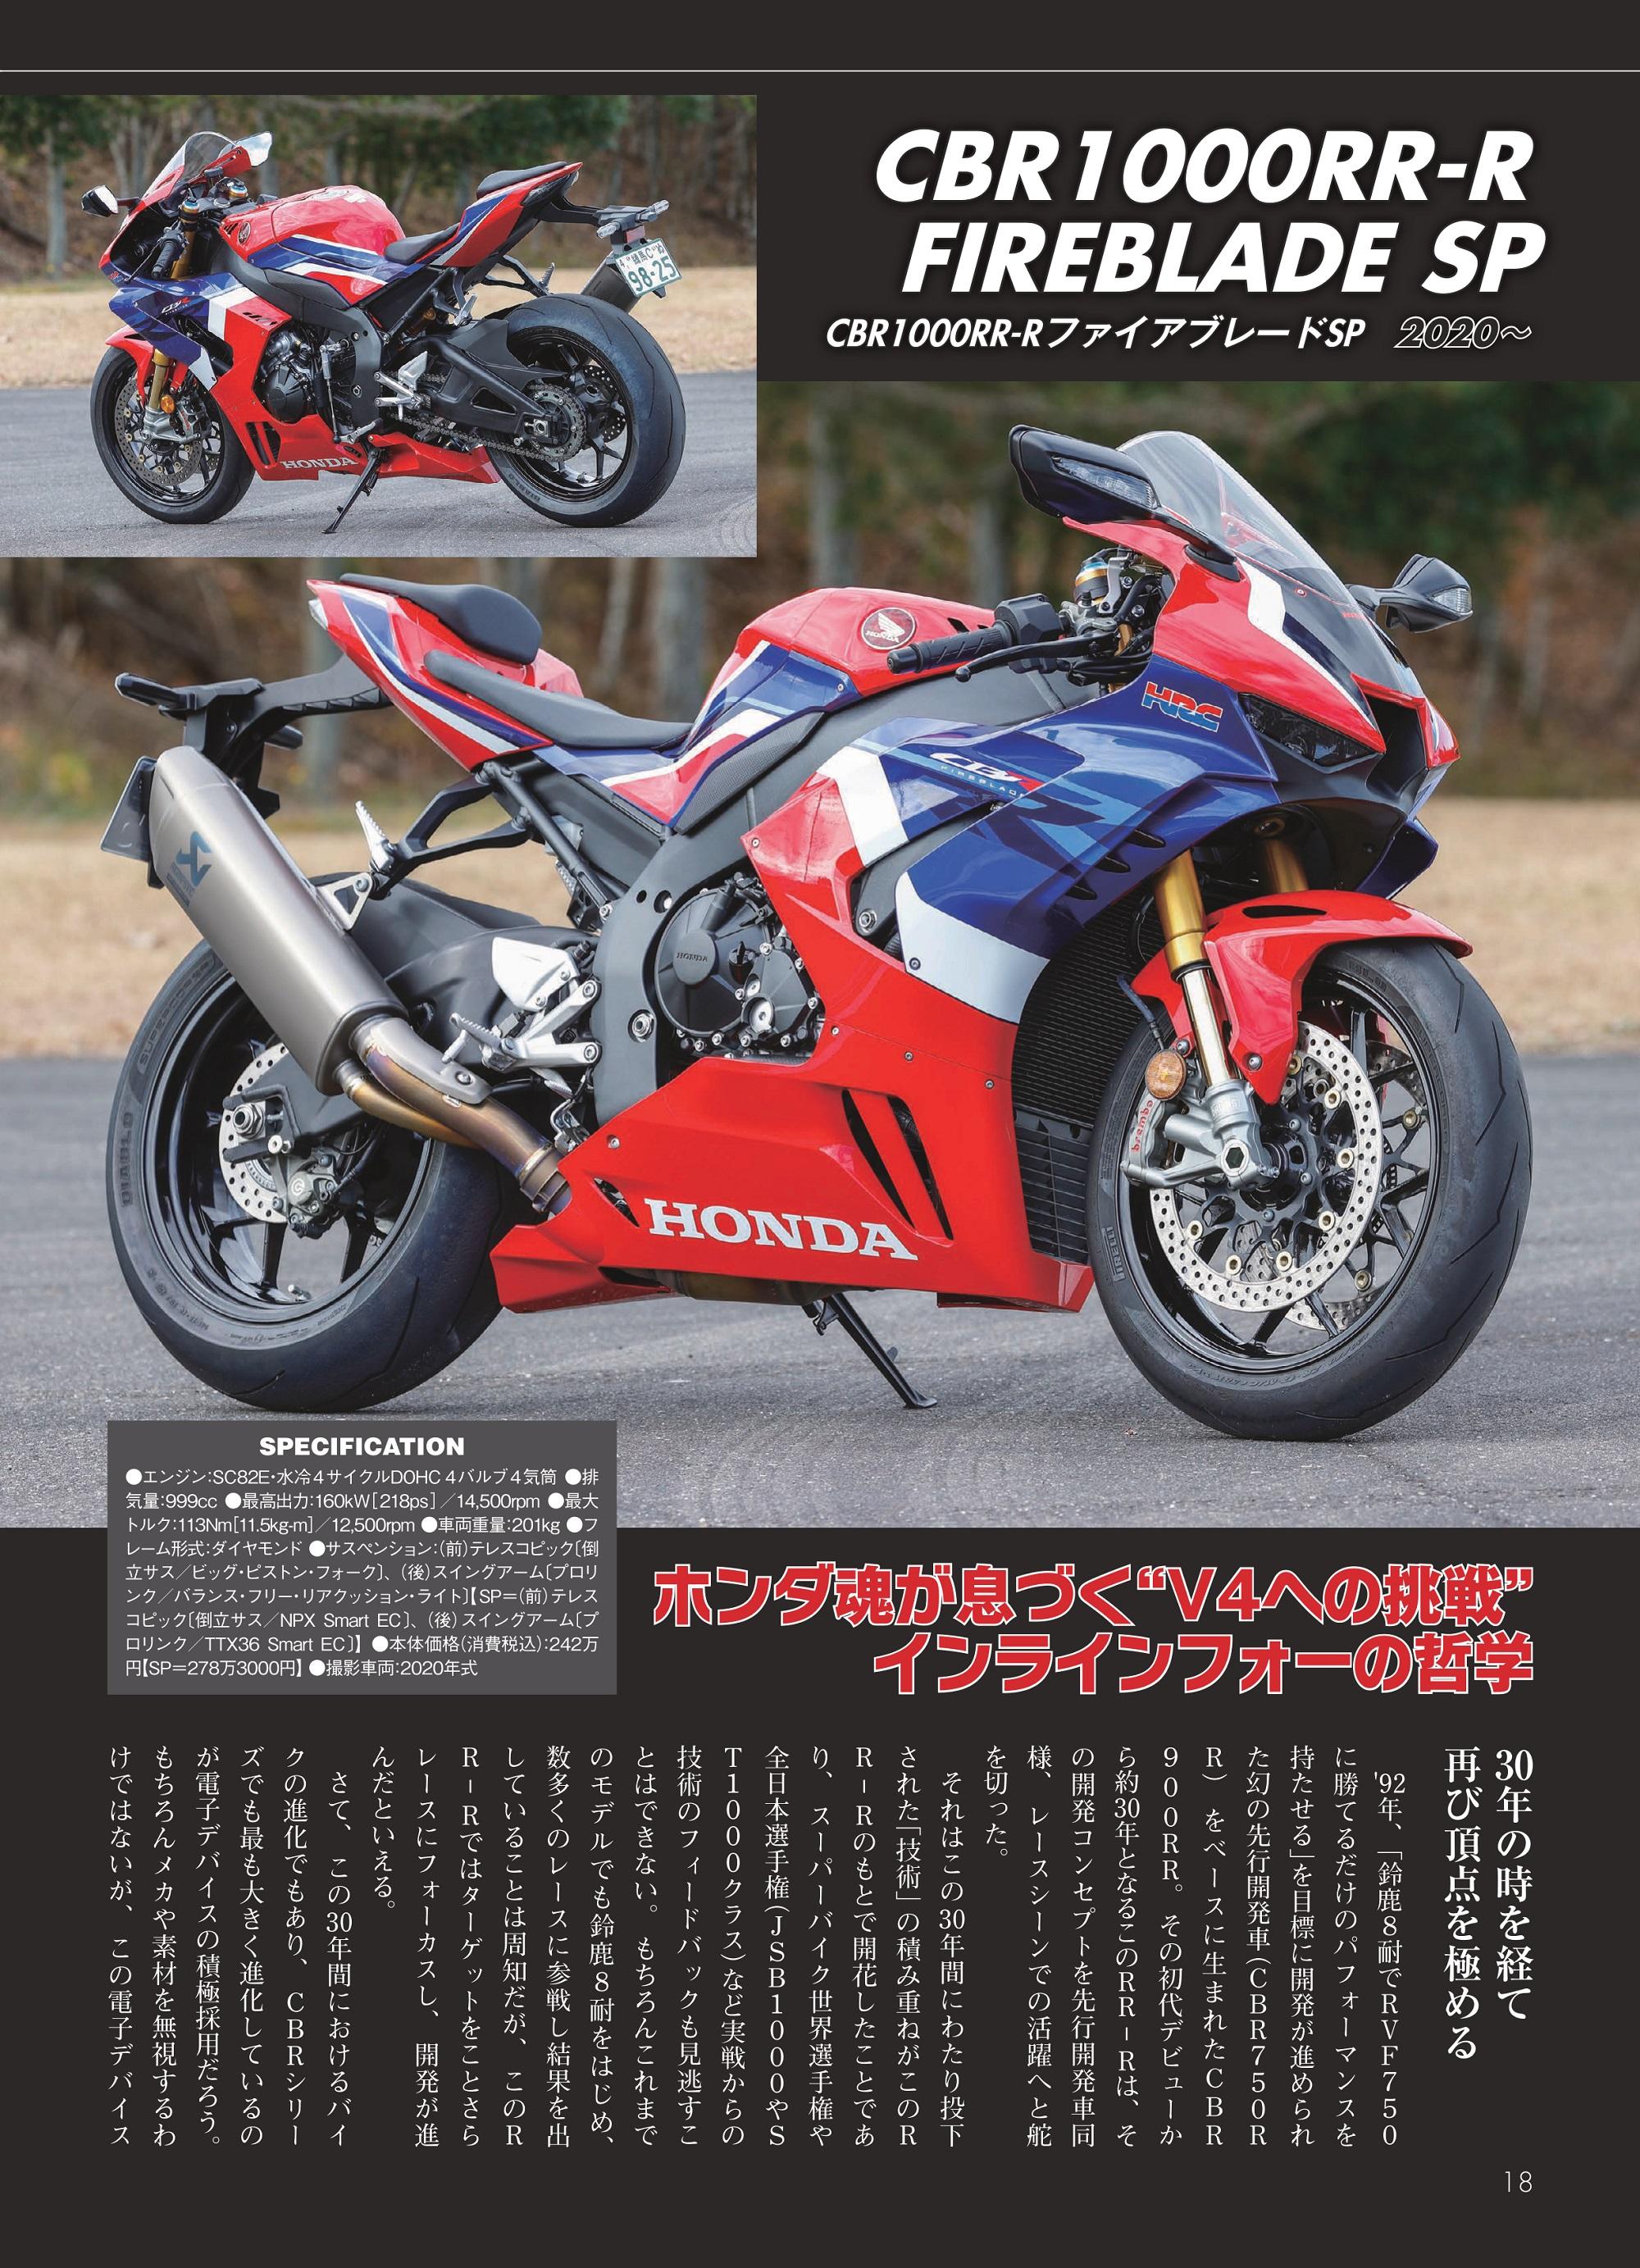 「CBR1000RR-R FIREBLADE SP」紙面